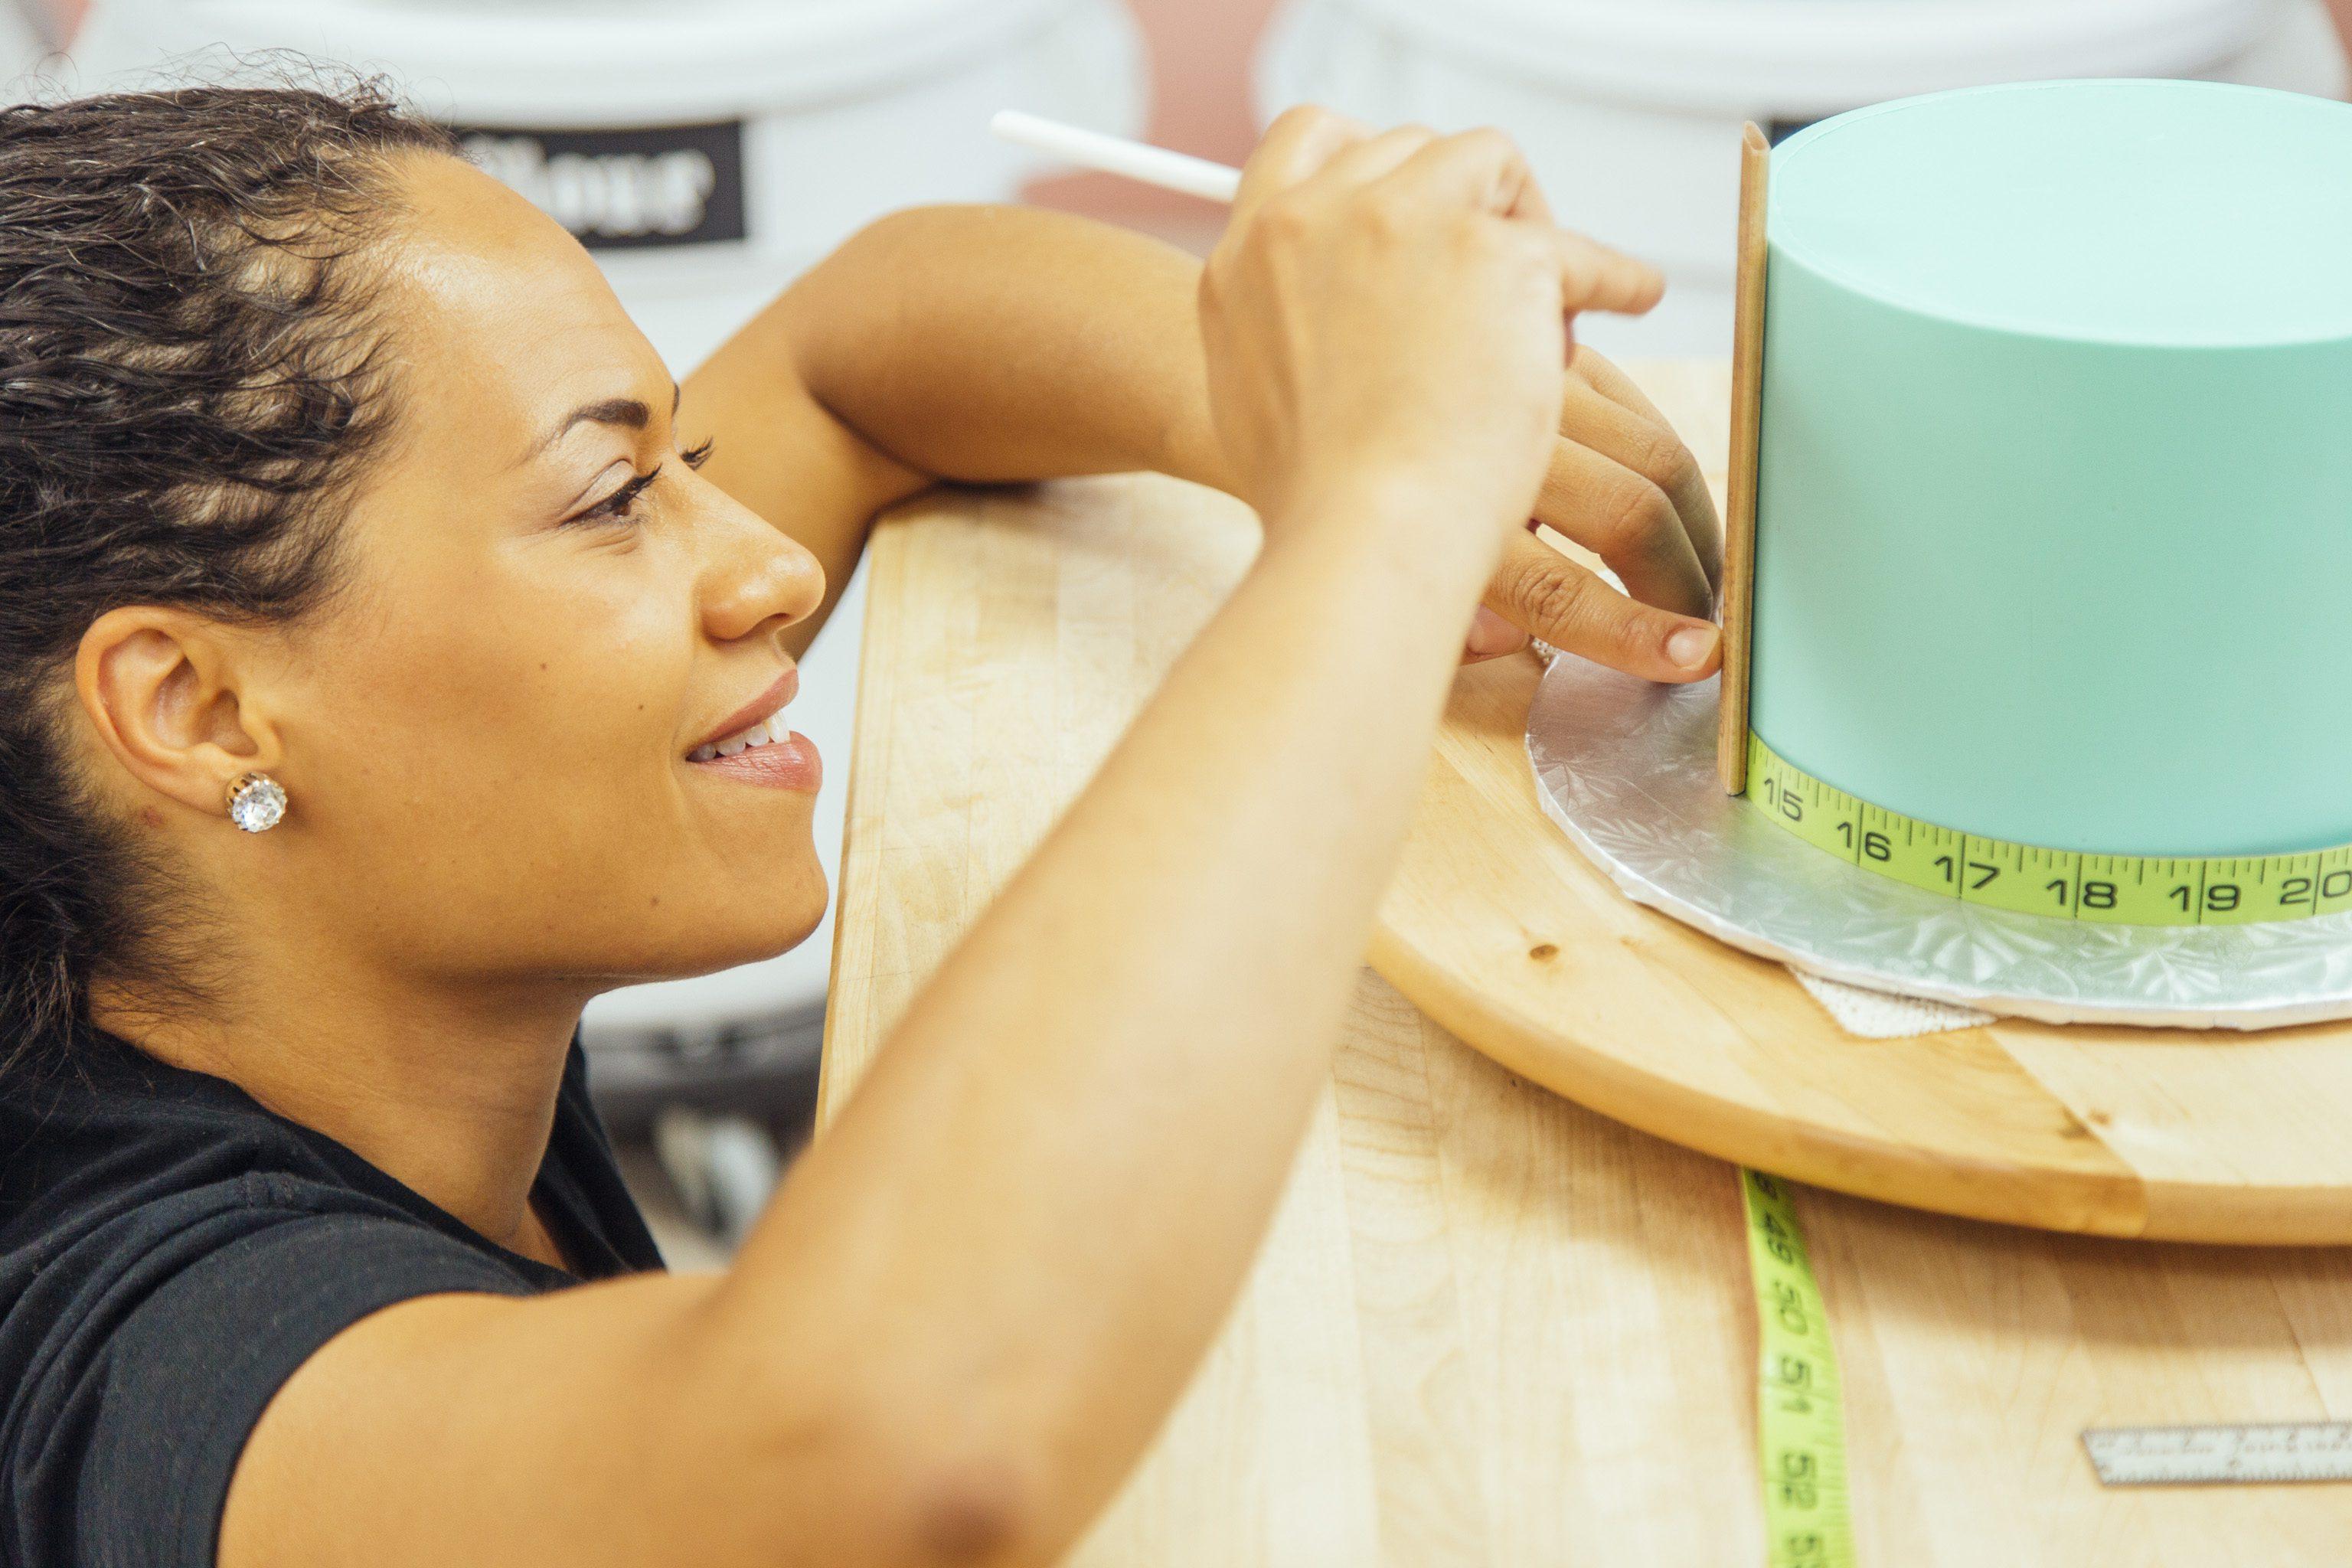 Yolanda_HTCI_measuringcake